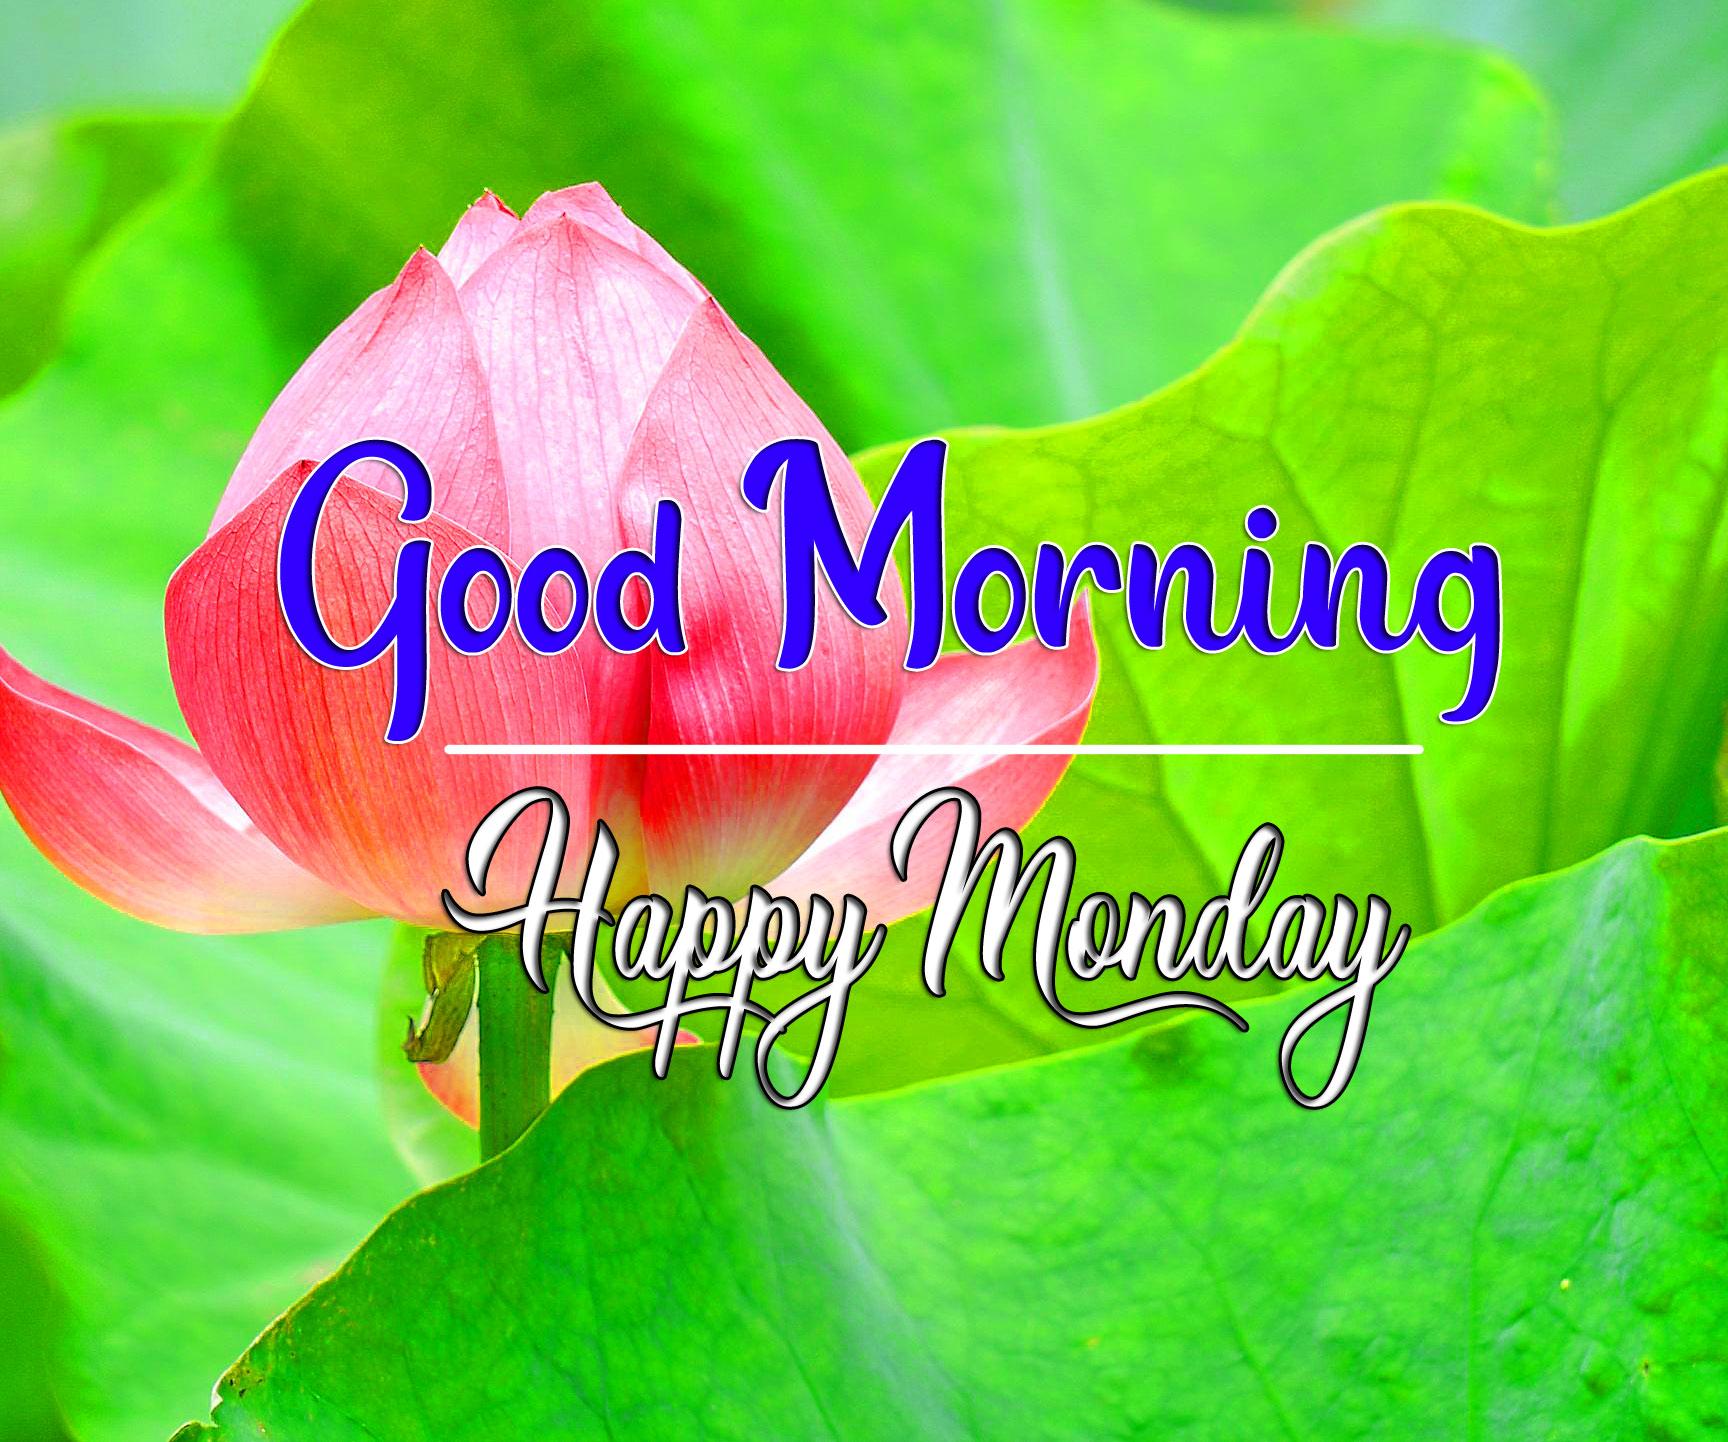 Free HD Monday Good Morning Images 3 1